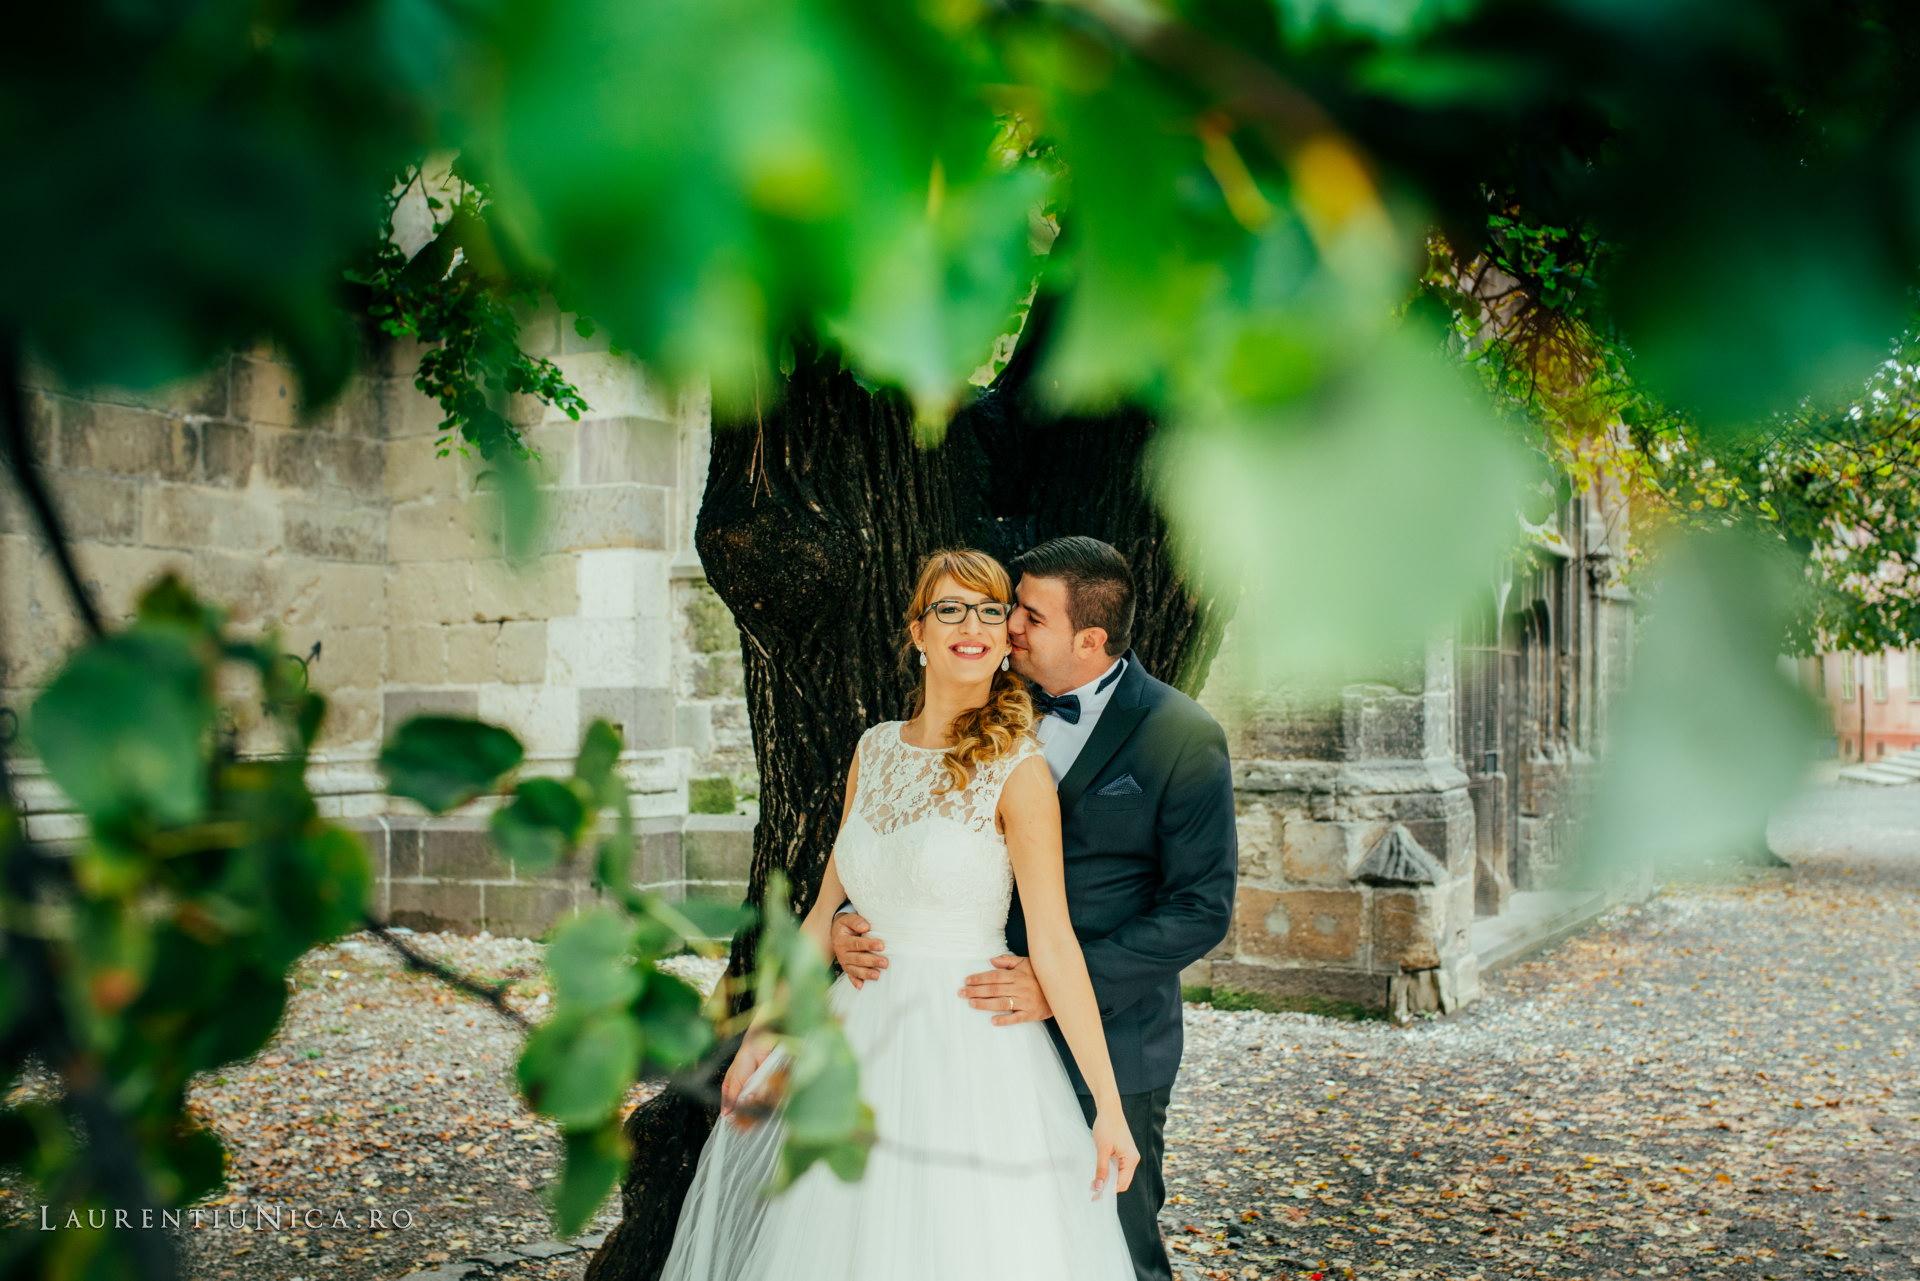 iulia-si-cosmin-fotografii-after-wedding-brasov-laurentiu-nica12